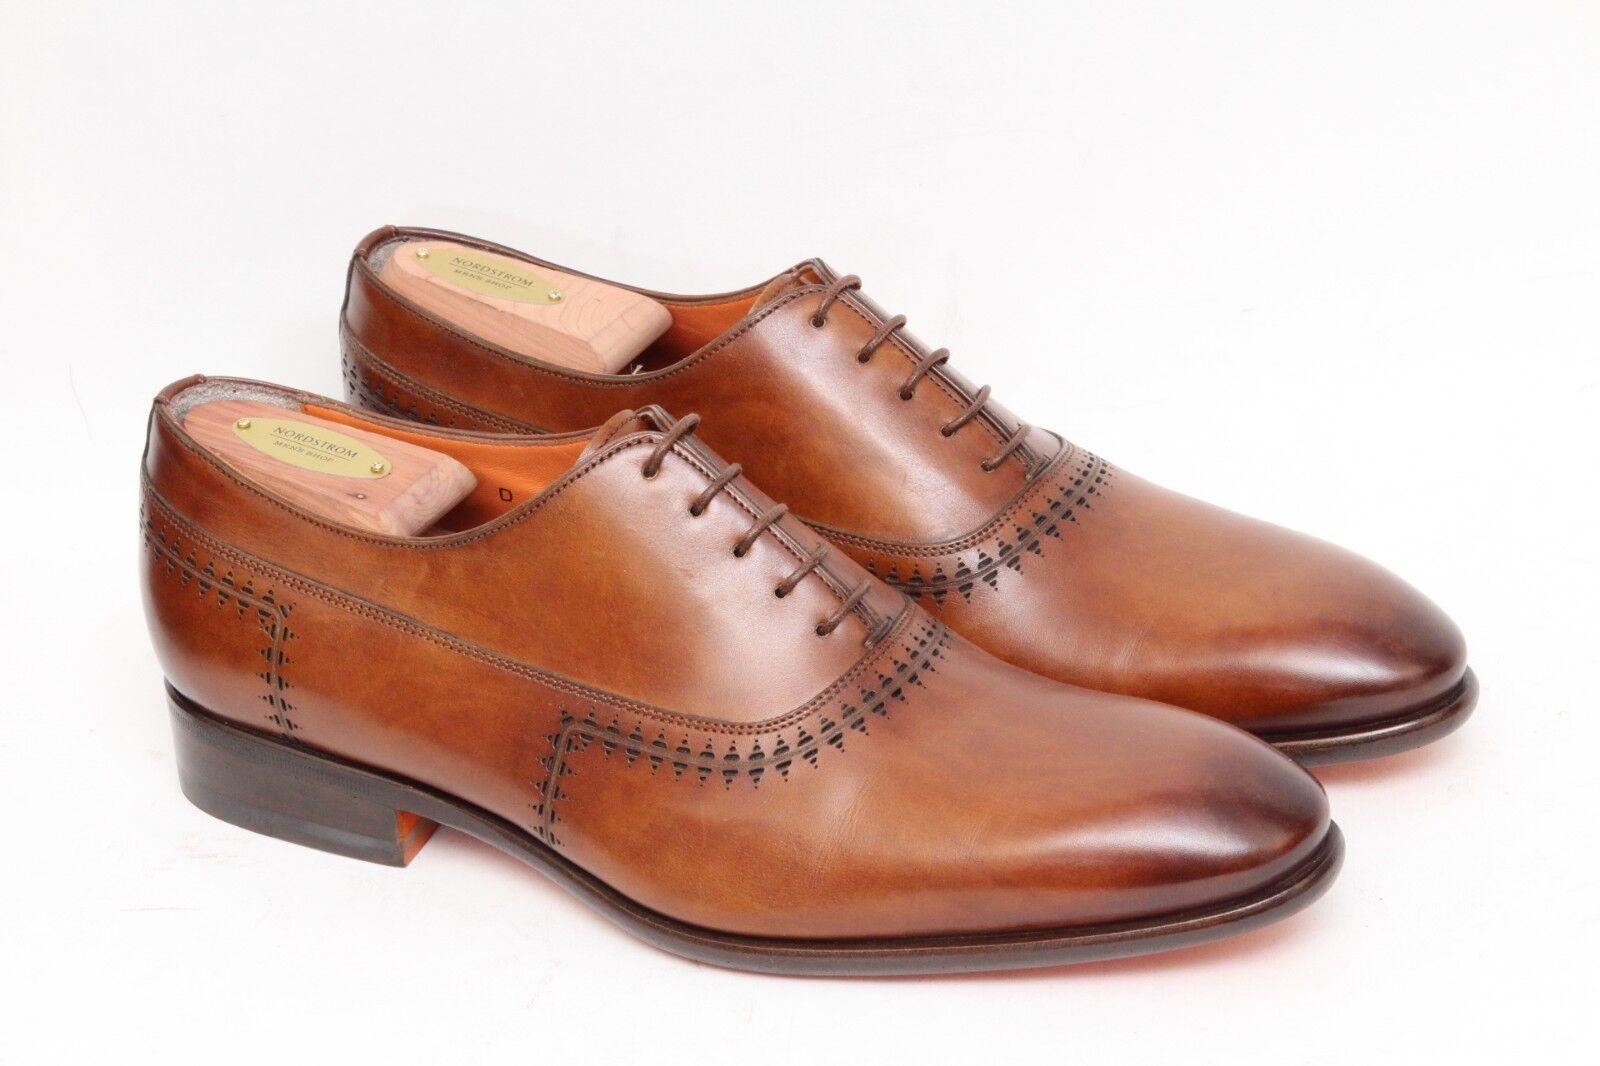 Santoni Brown Leather Fatte a Mano Brogue Wholecut Oxford new shoes Mens shoes Sz 9